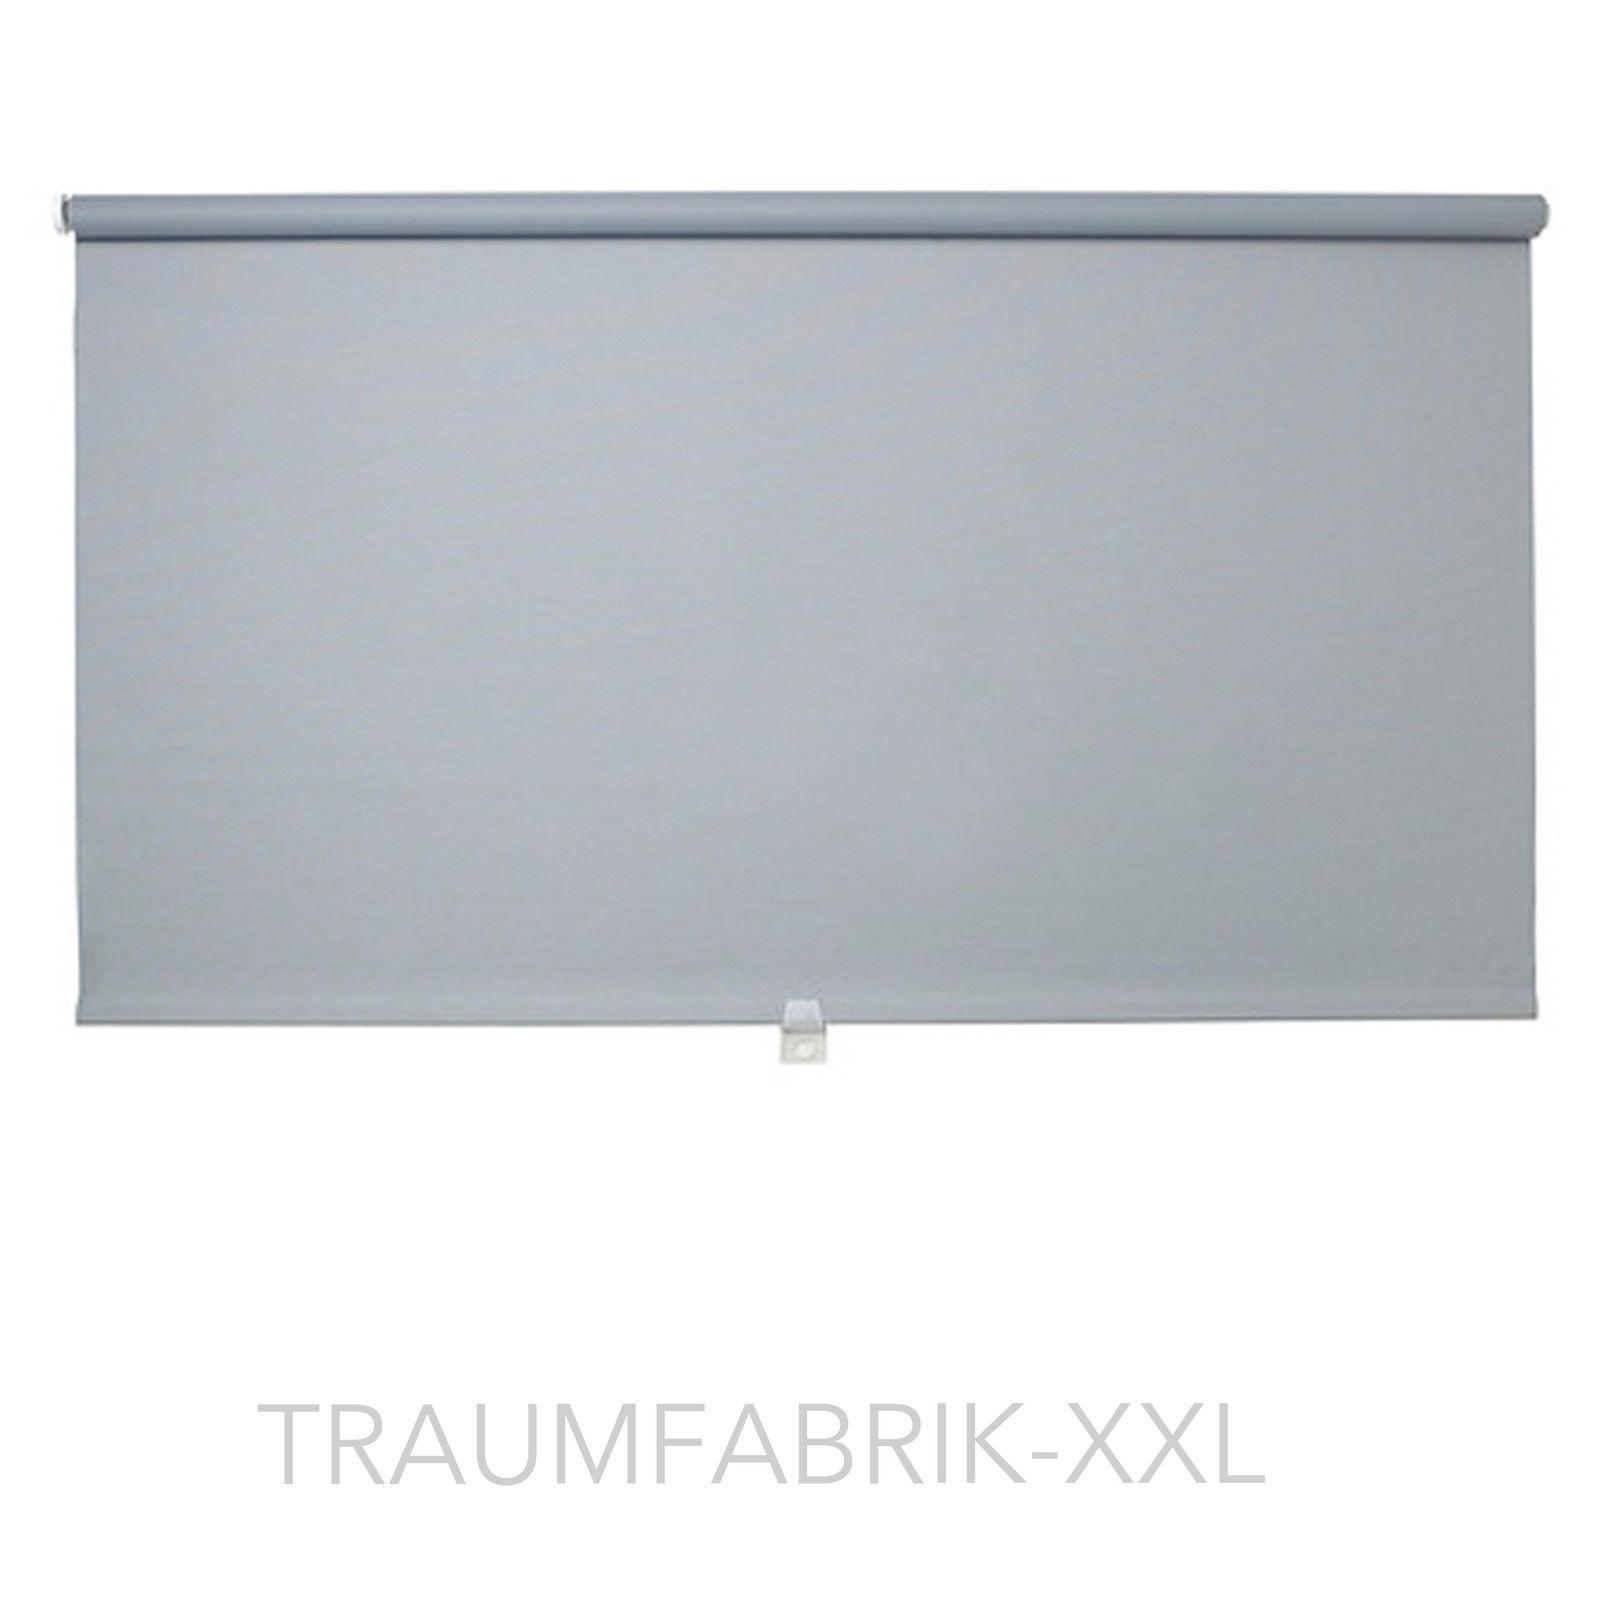 ikea tupplur verdunklungsrollo in grau 120 x 195 cm. Black Bedroom Furniture Sets. Home Design Ideas